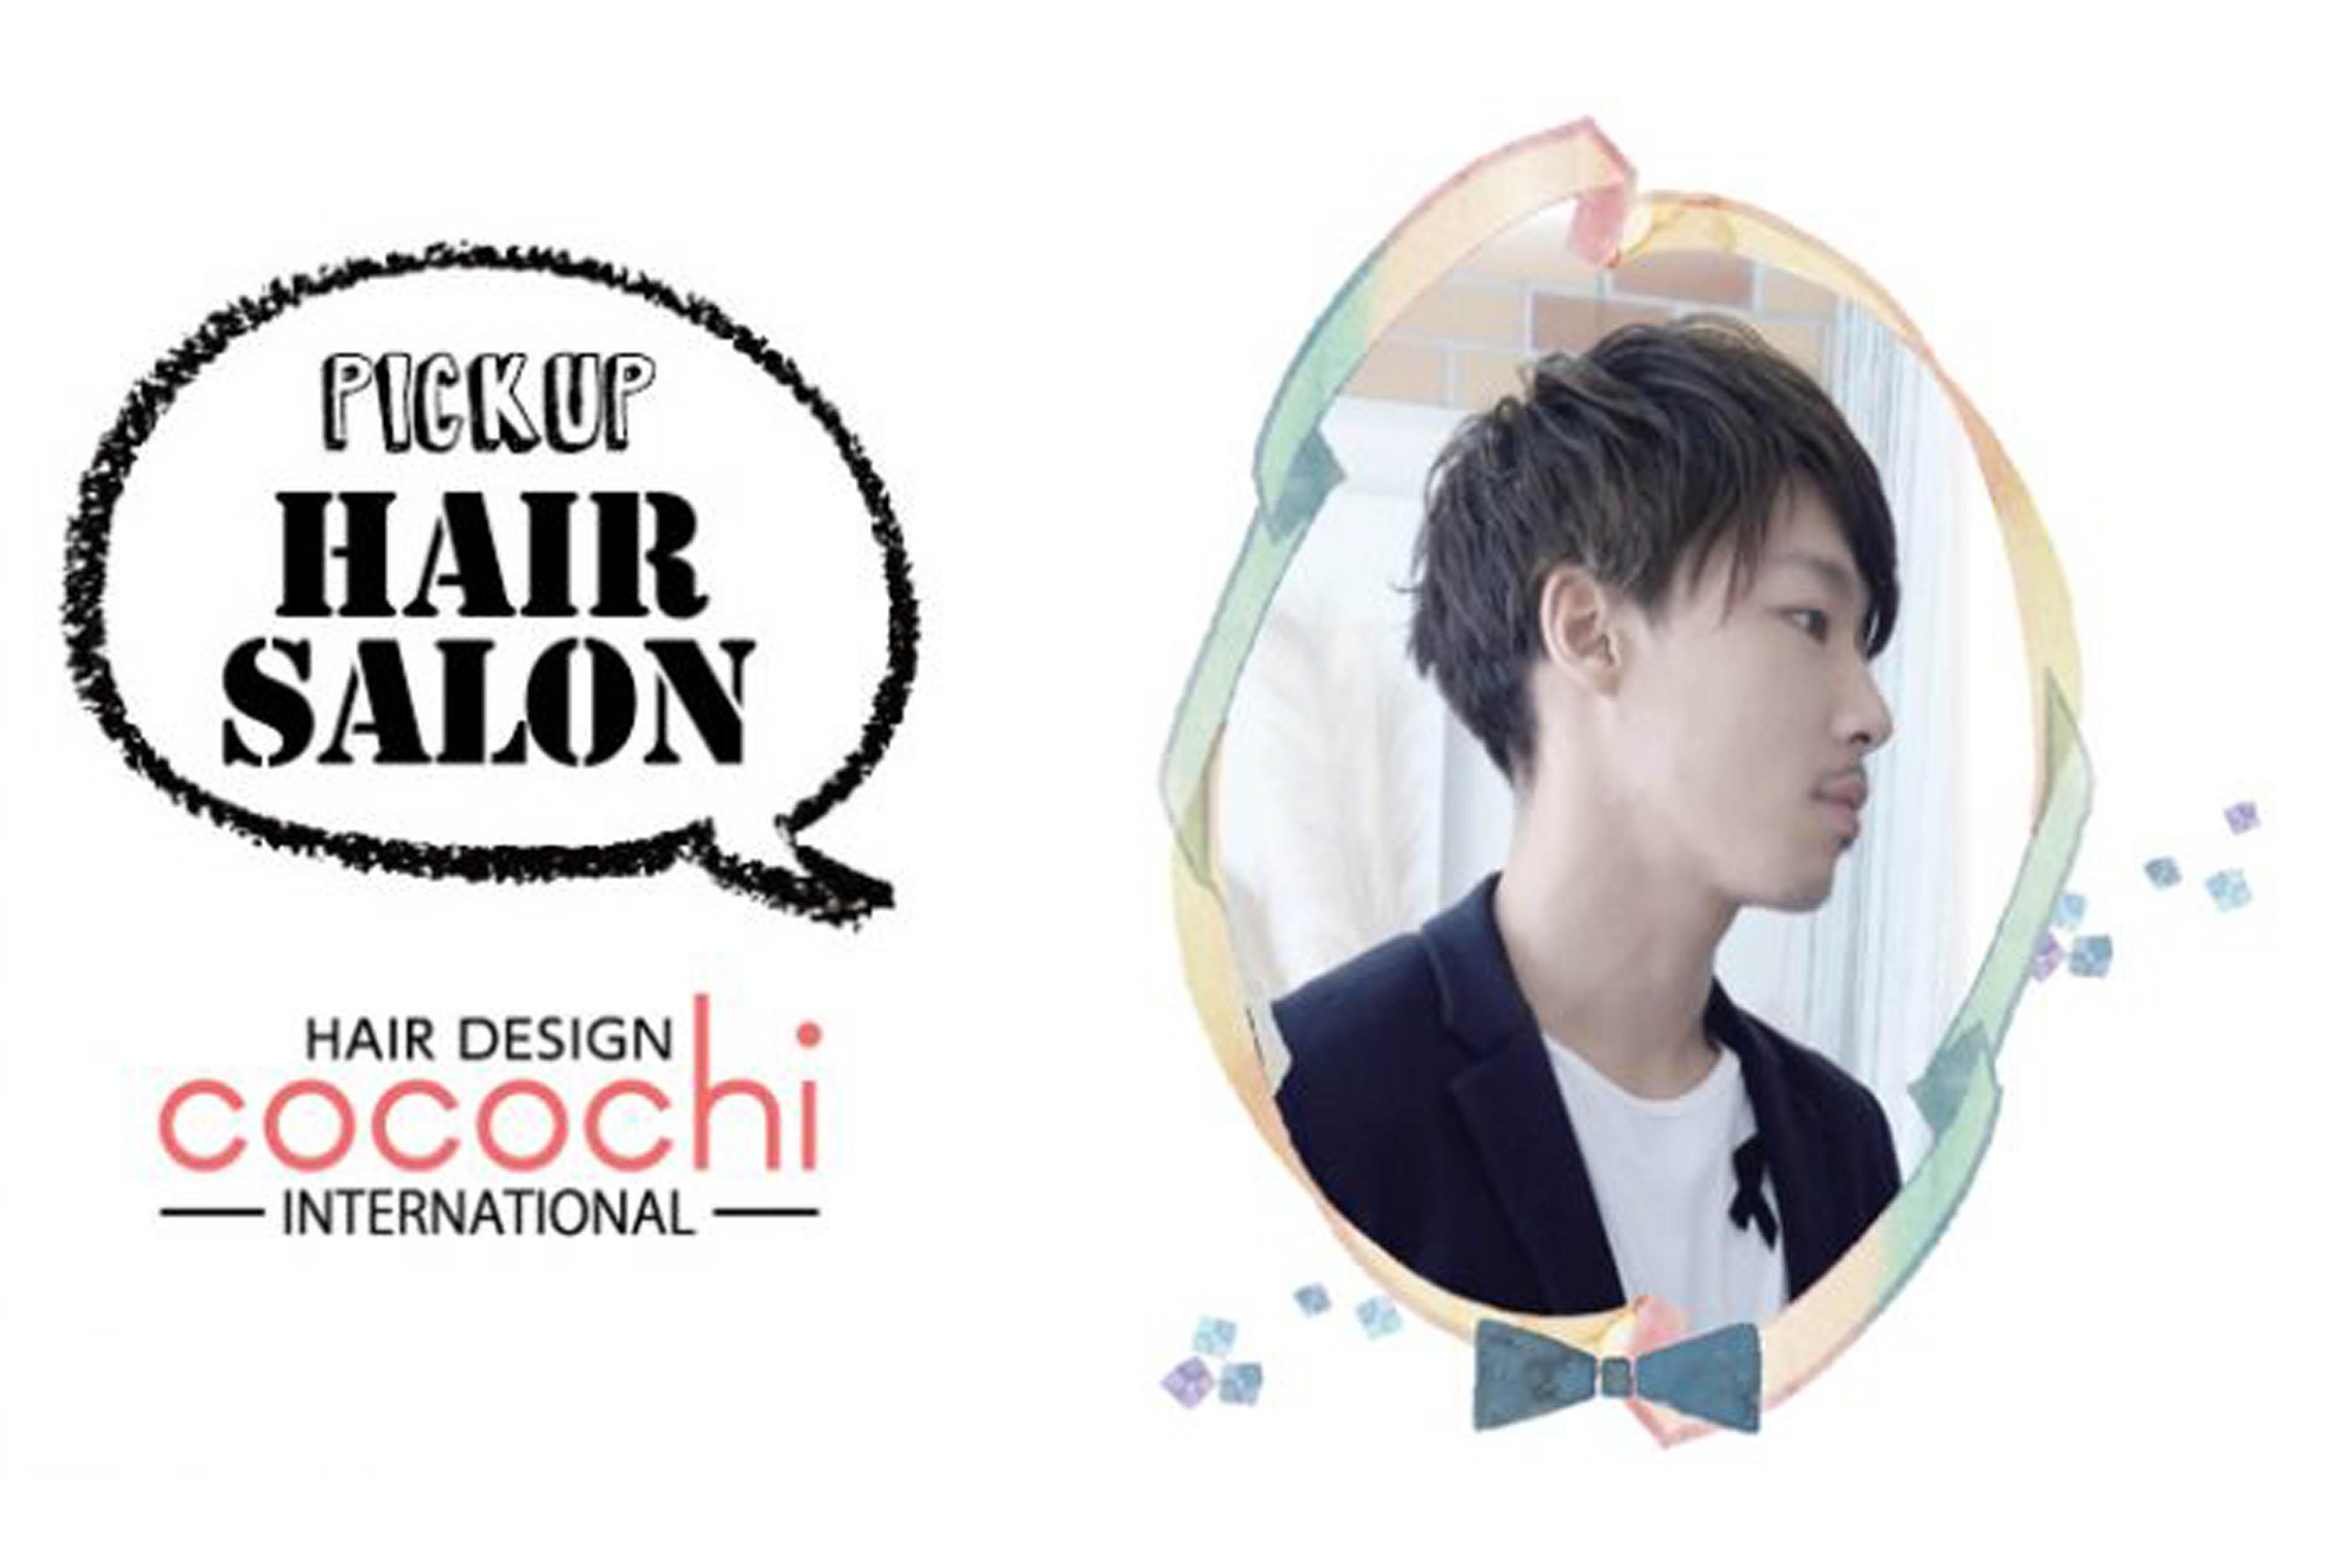 【PICK UP HAIR SALON】 COCOCHI